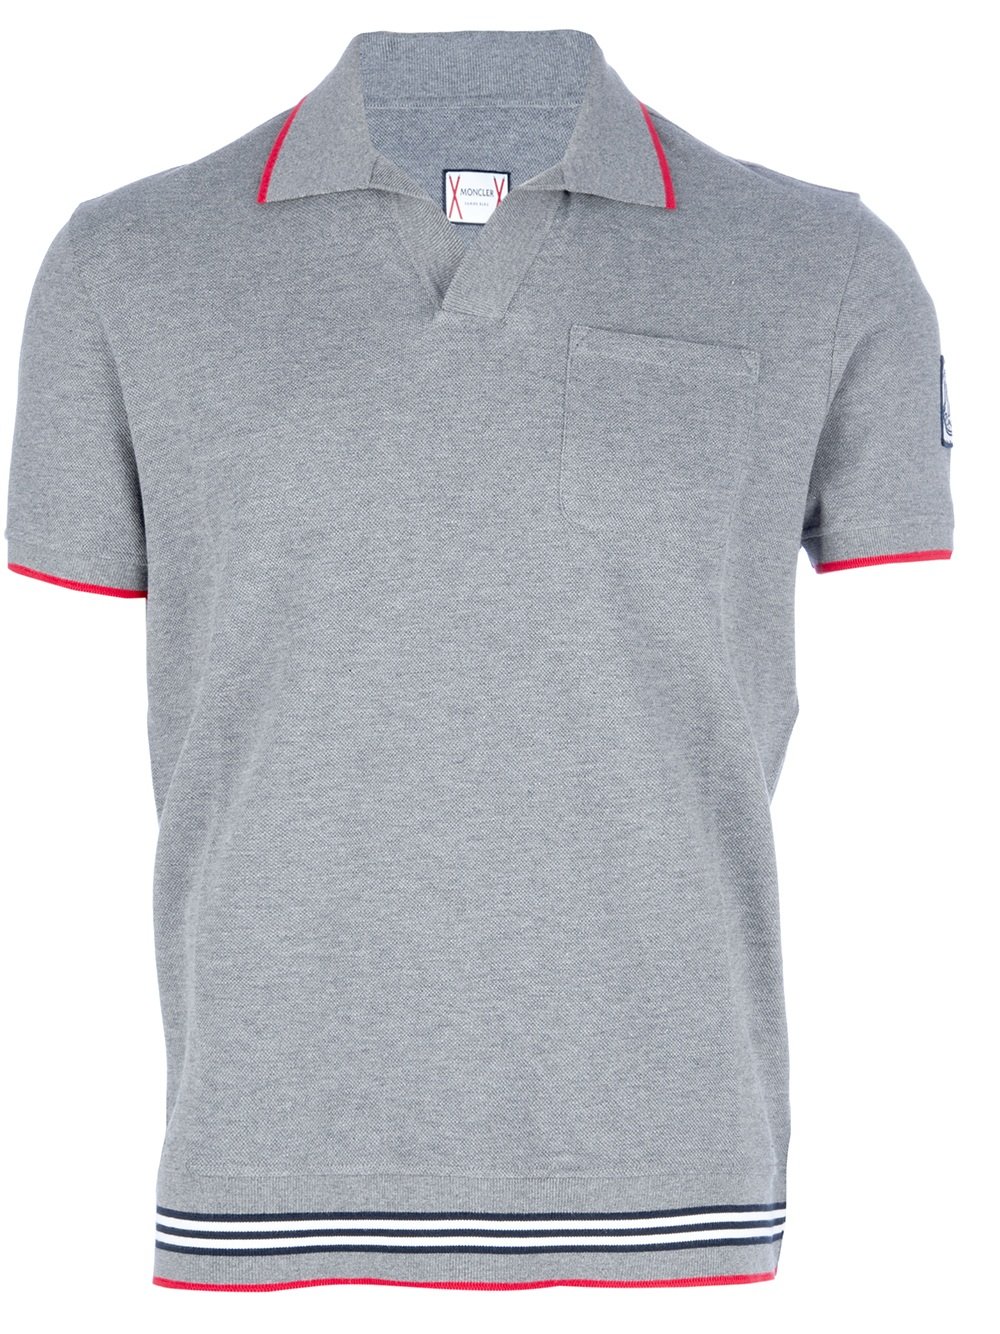 Moncler Gamme Bleu Classic Polo Shirt In Gray For Men